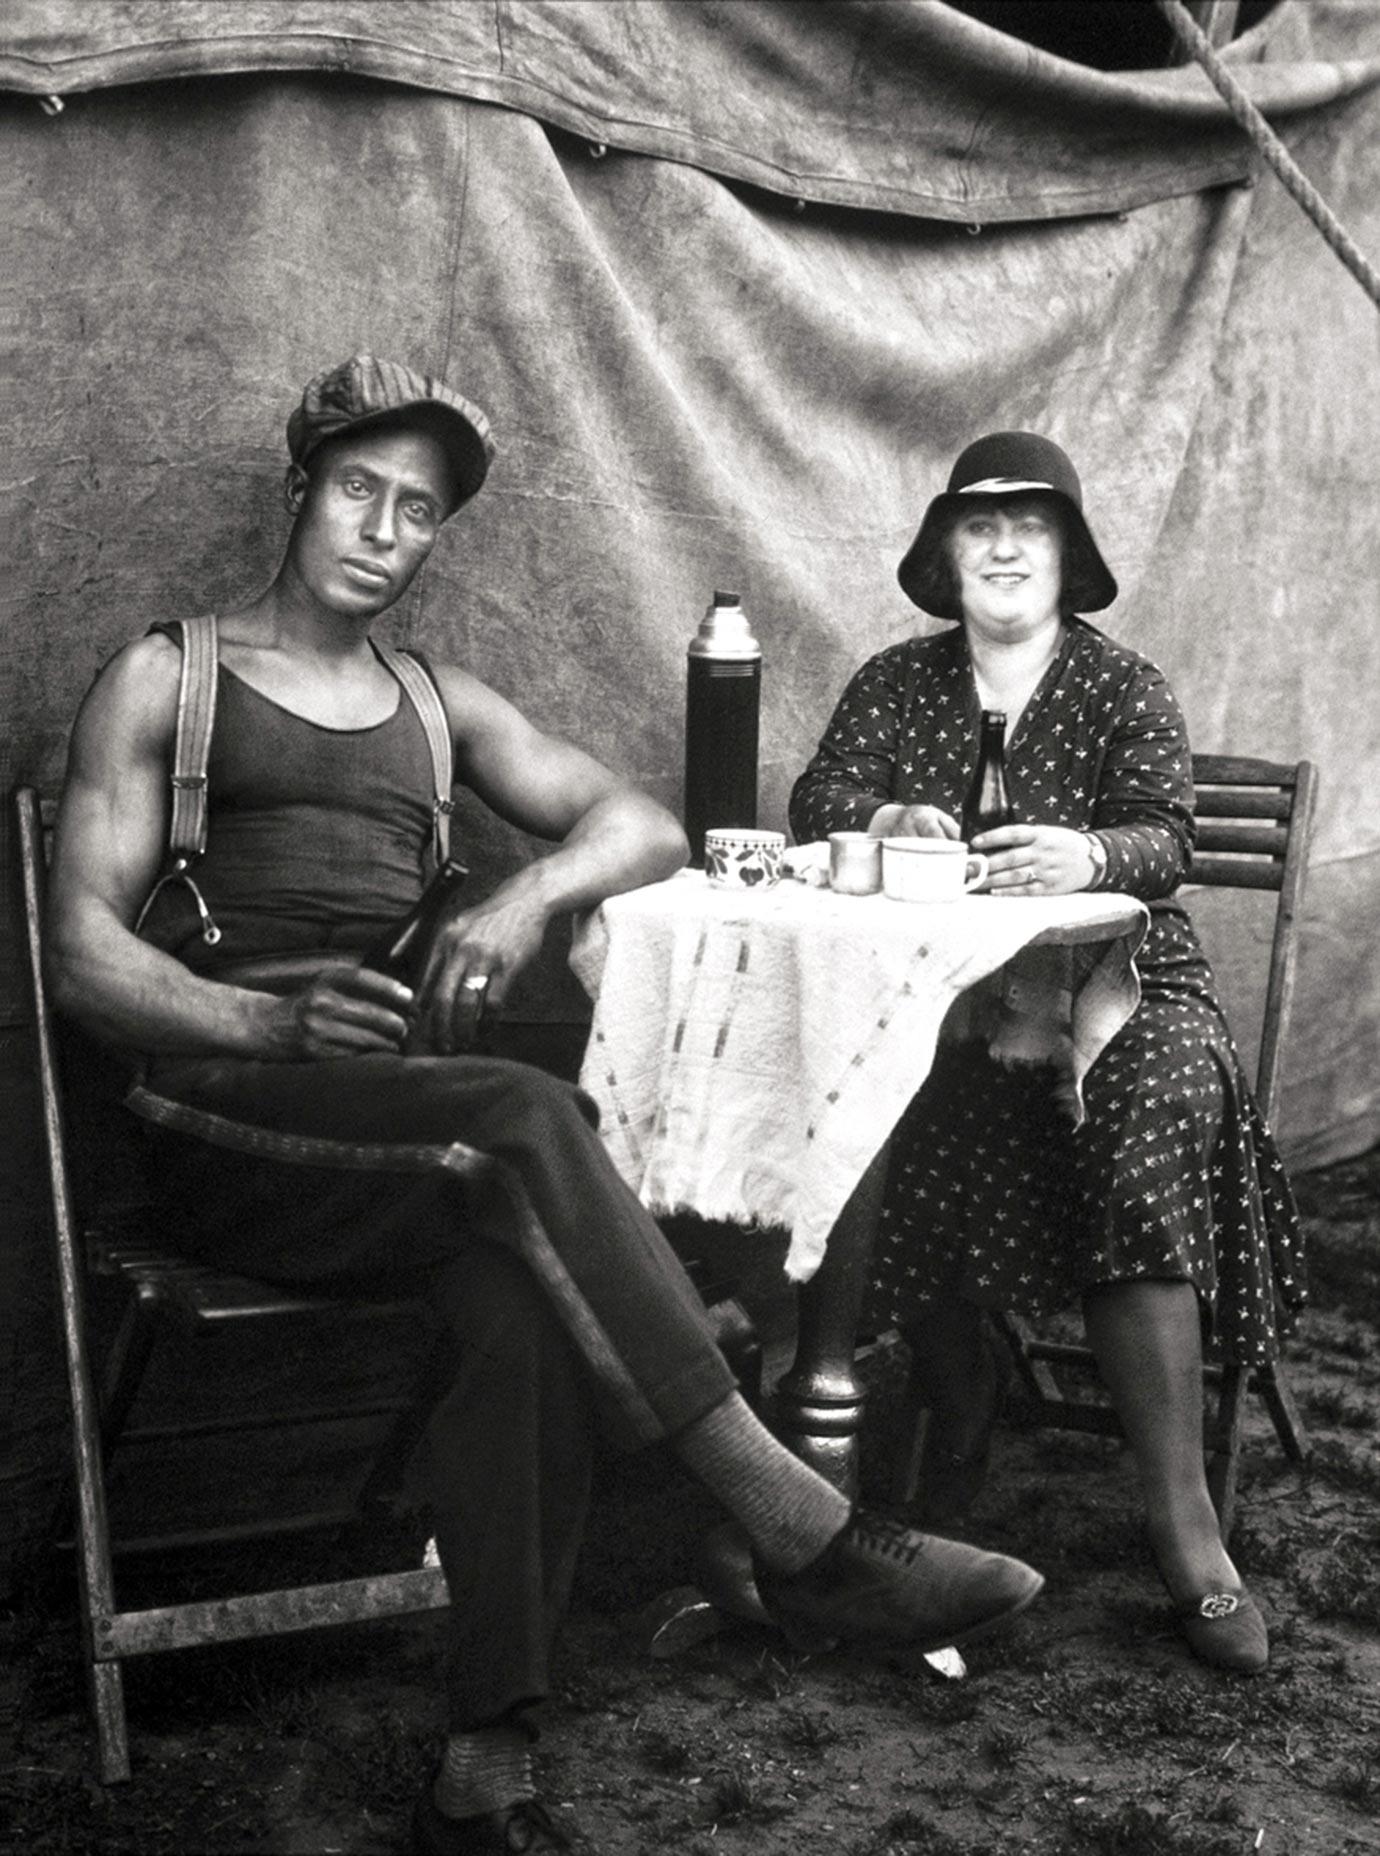 Zirkusartisten, 1926, August Sander